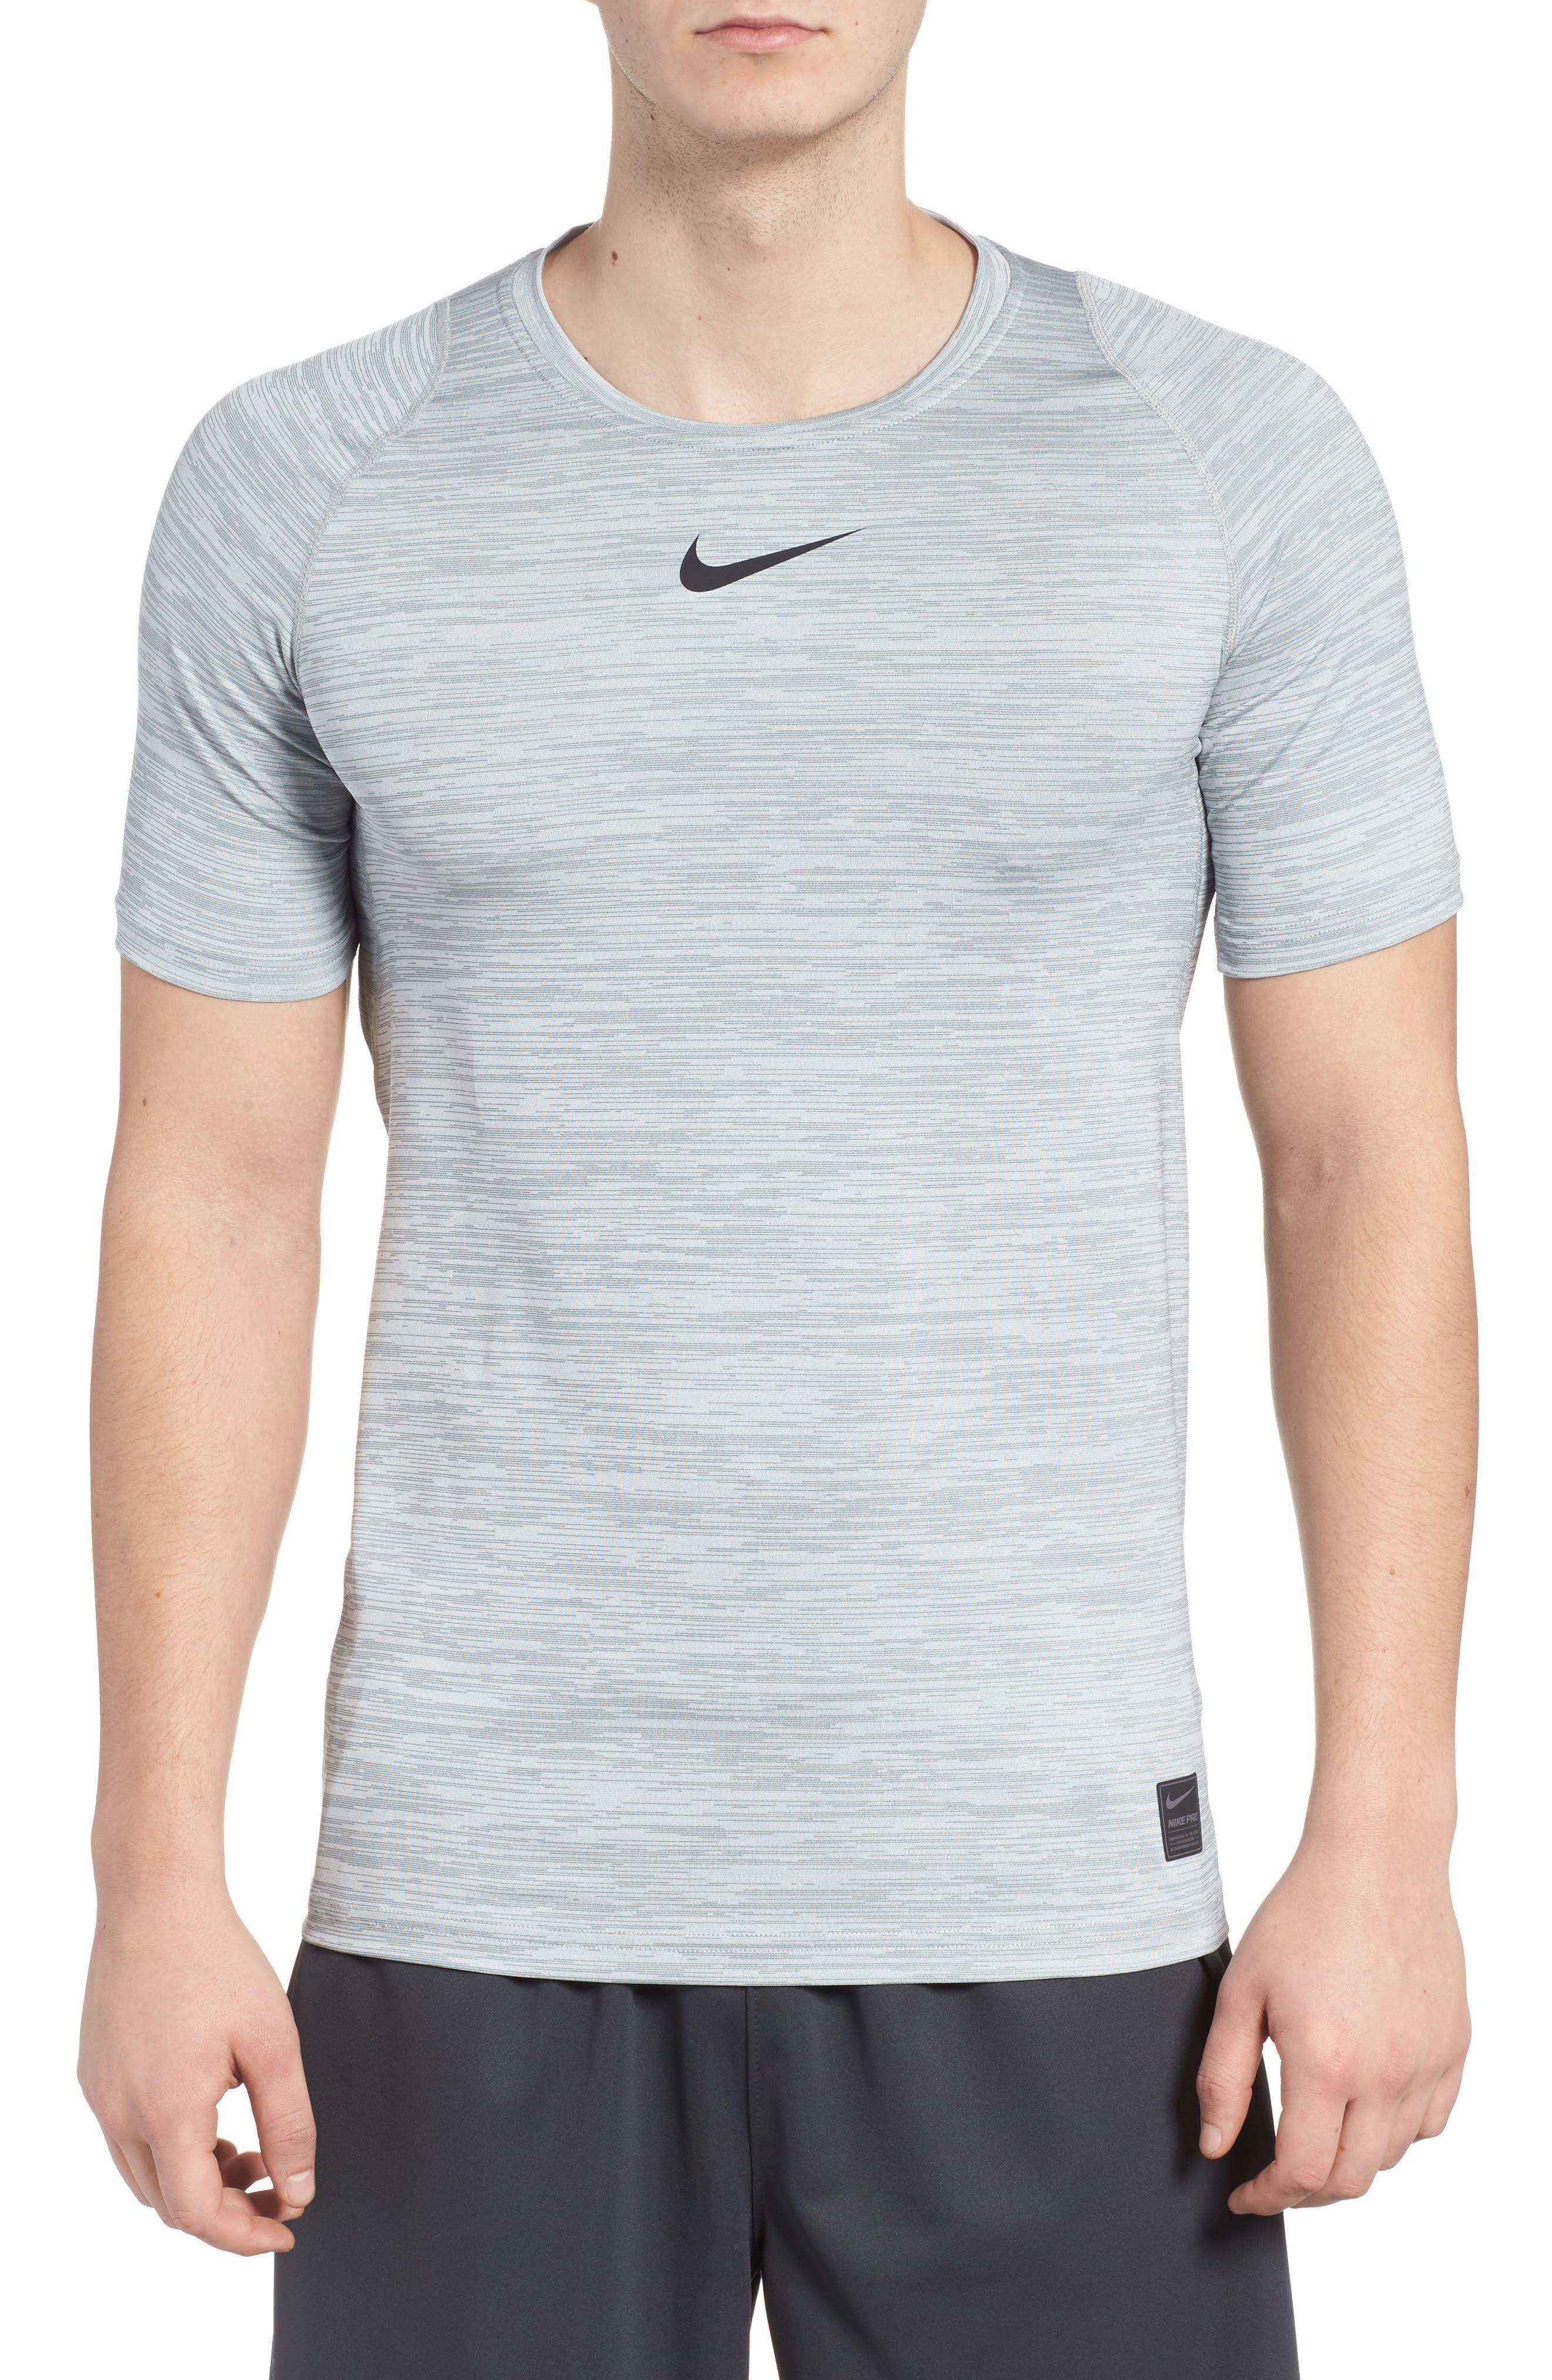 Training Top Crewneck T-Shirt,                             Main thumbnail 1, color,                             Cool Grey/ White/ Black